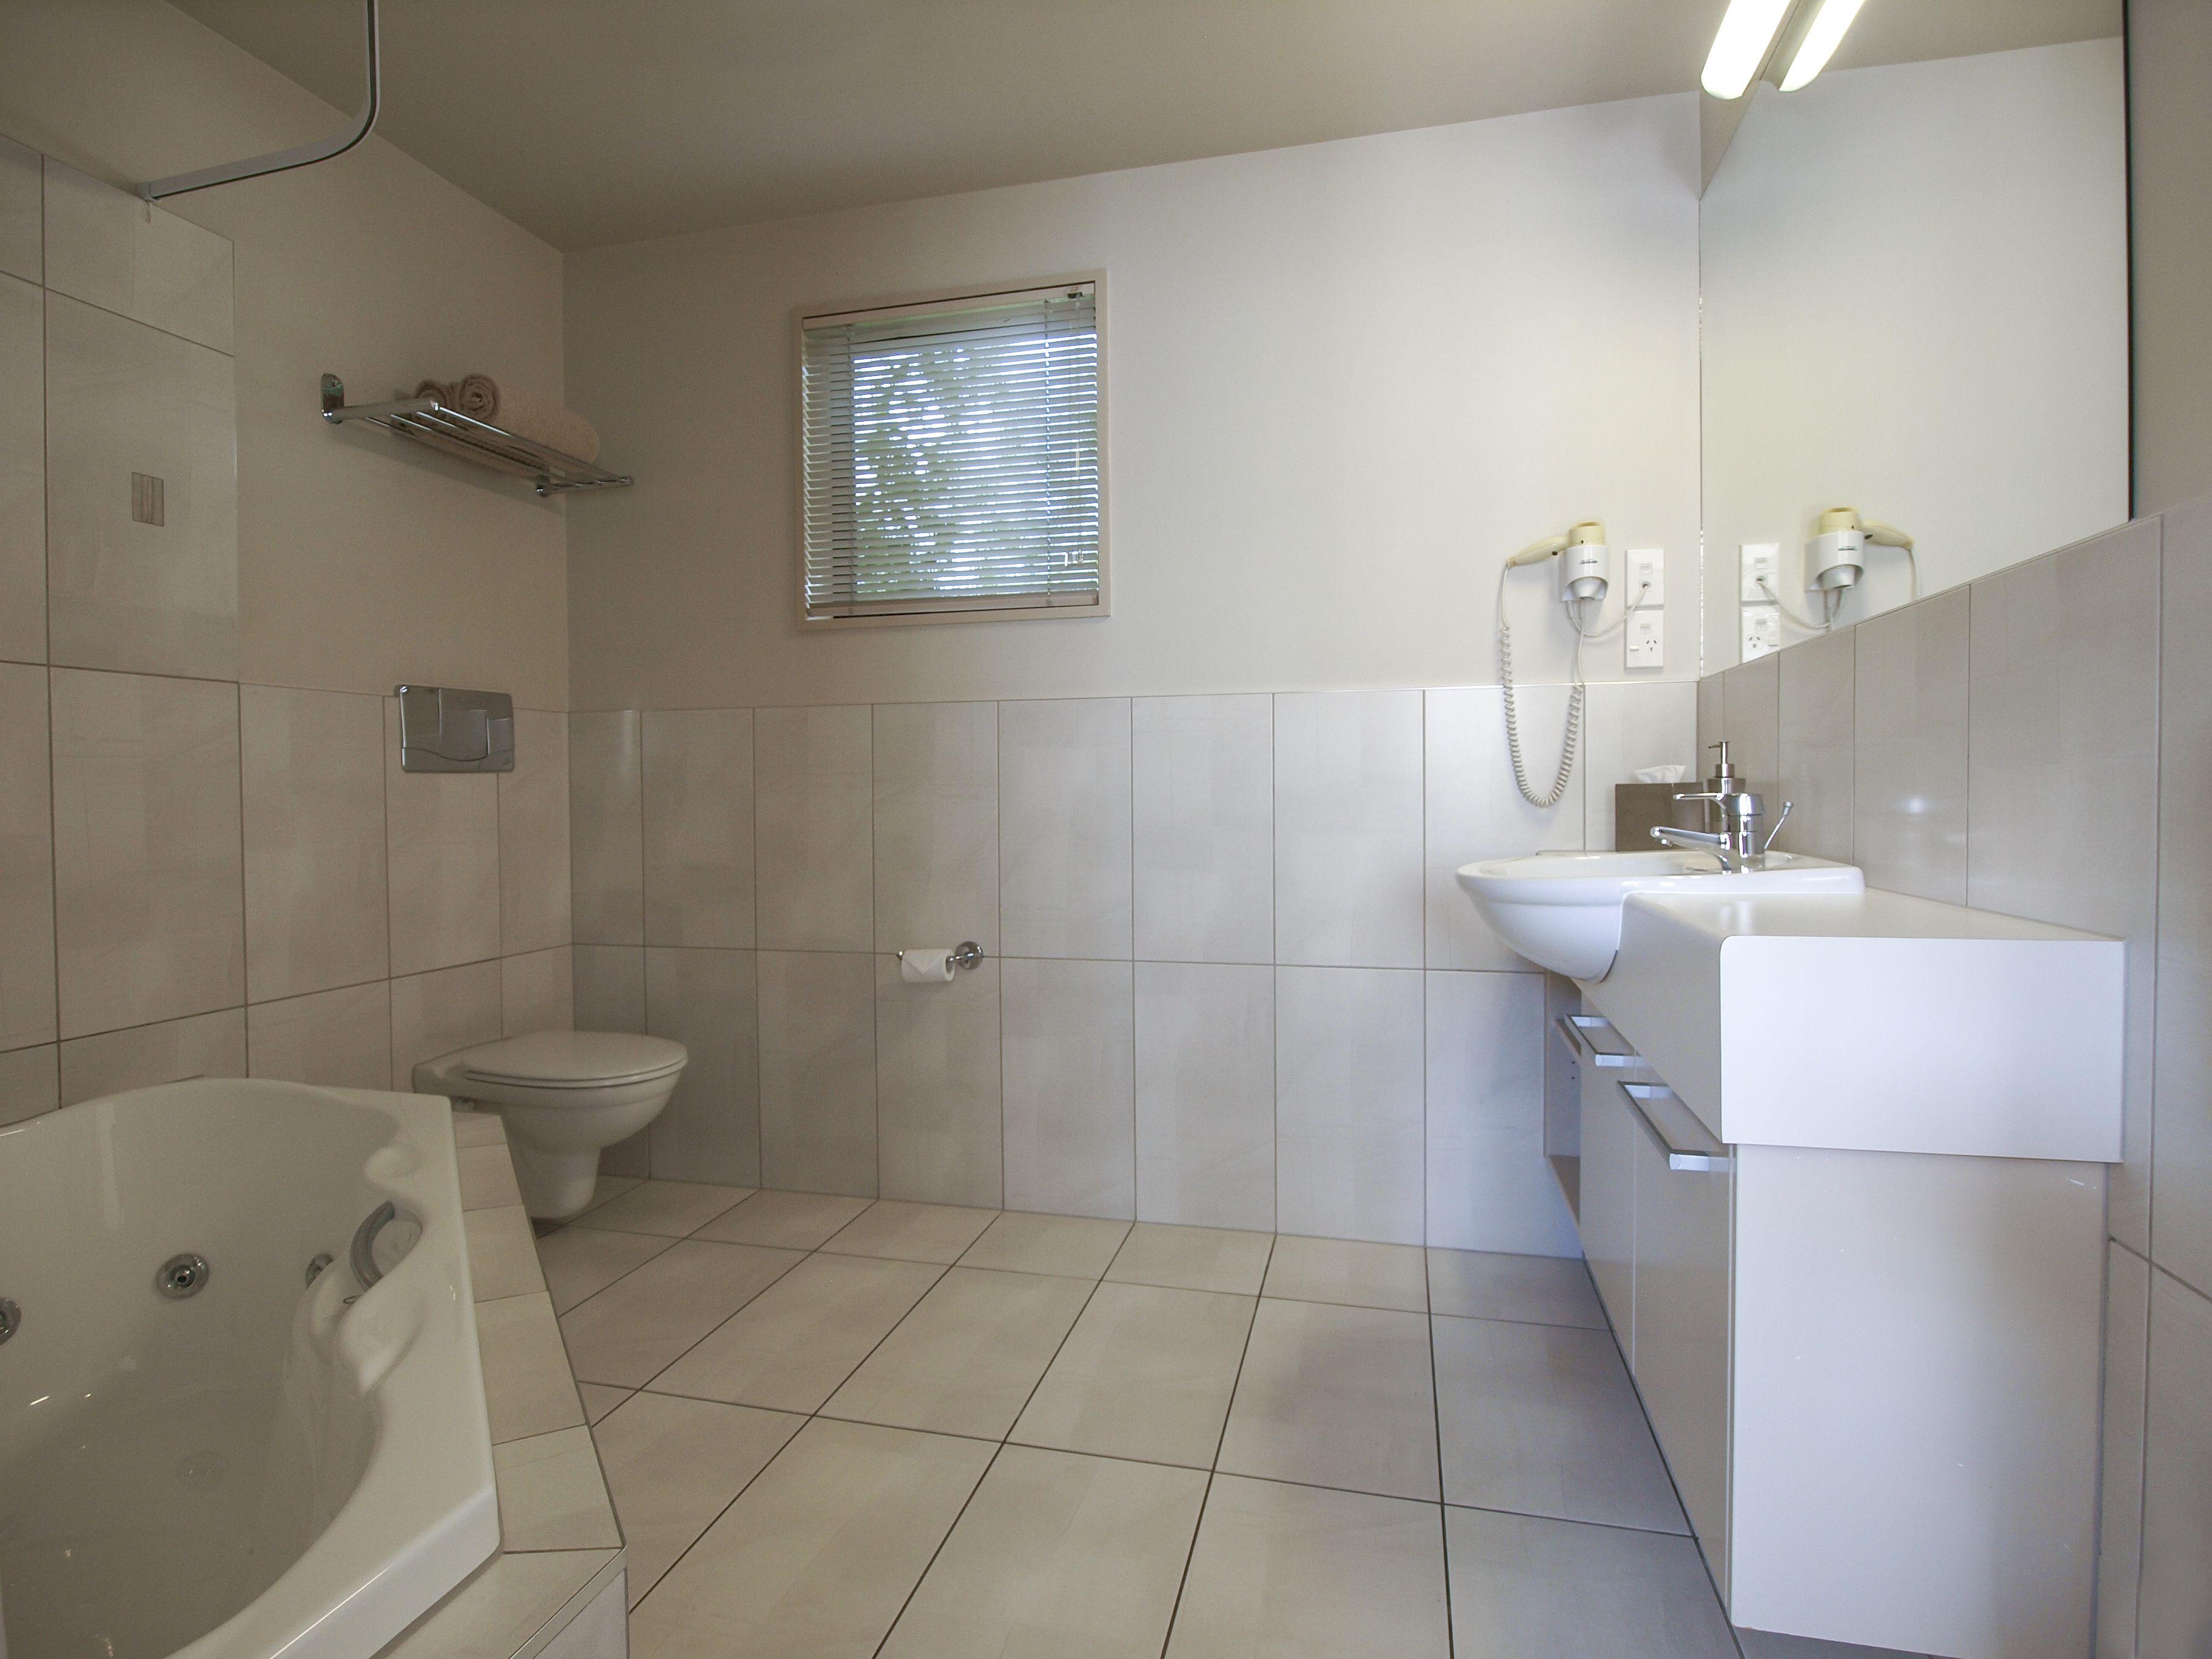 Master bedroom kitchenette  Beautifully appointed upmarket Italian livingu Kingsize bed u able